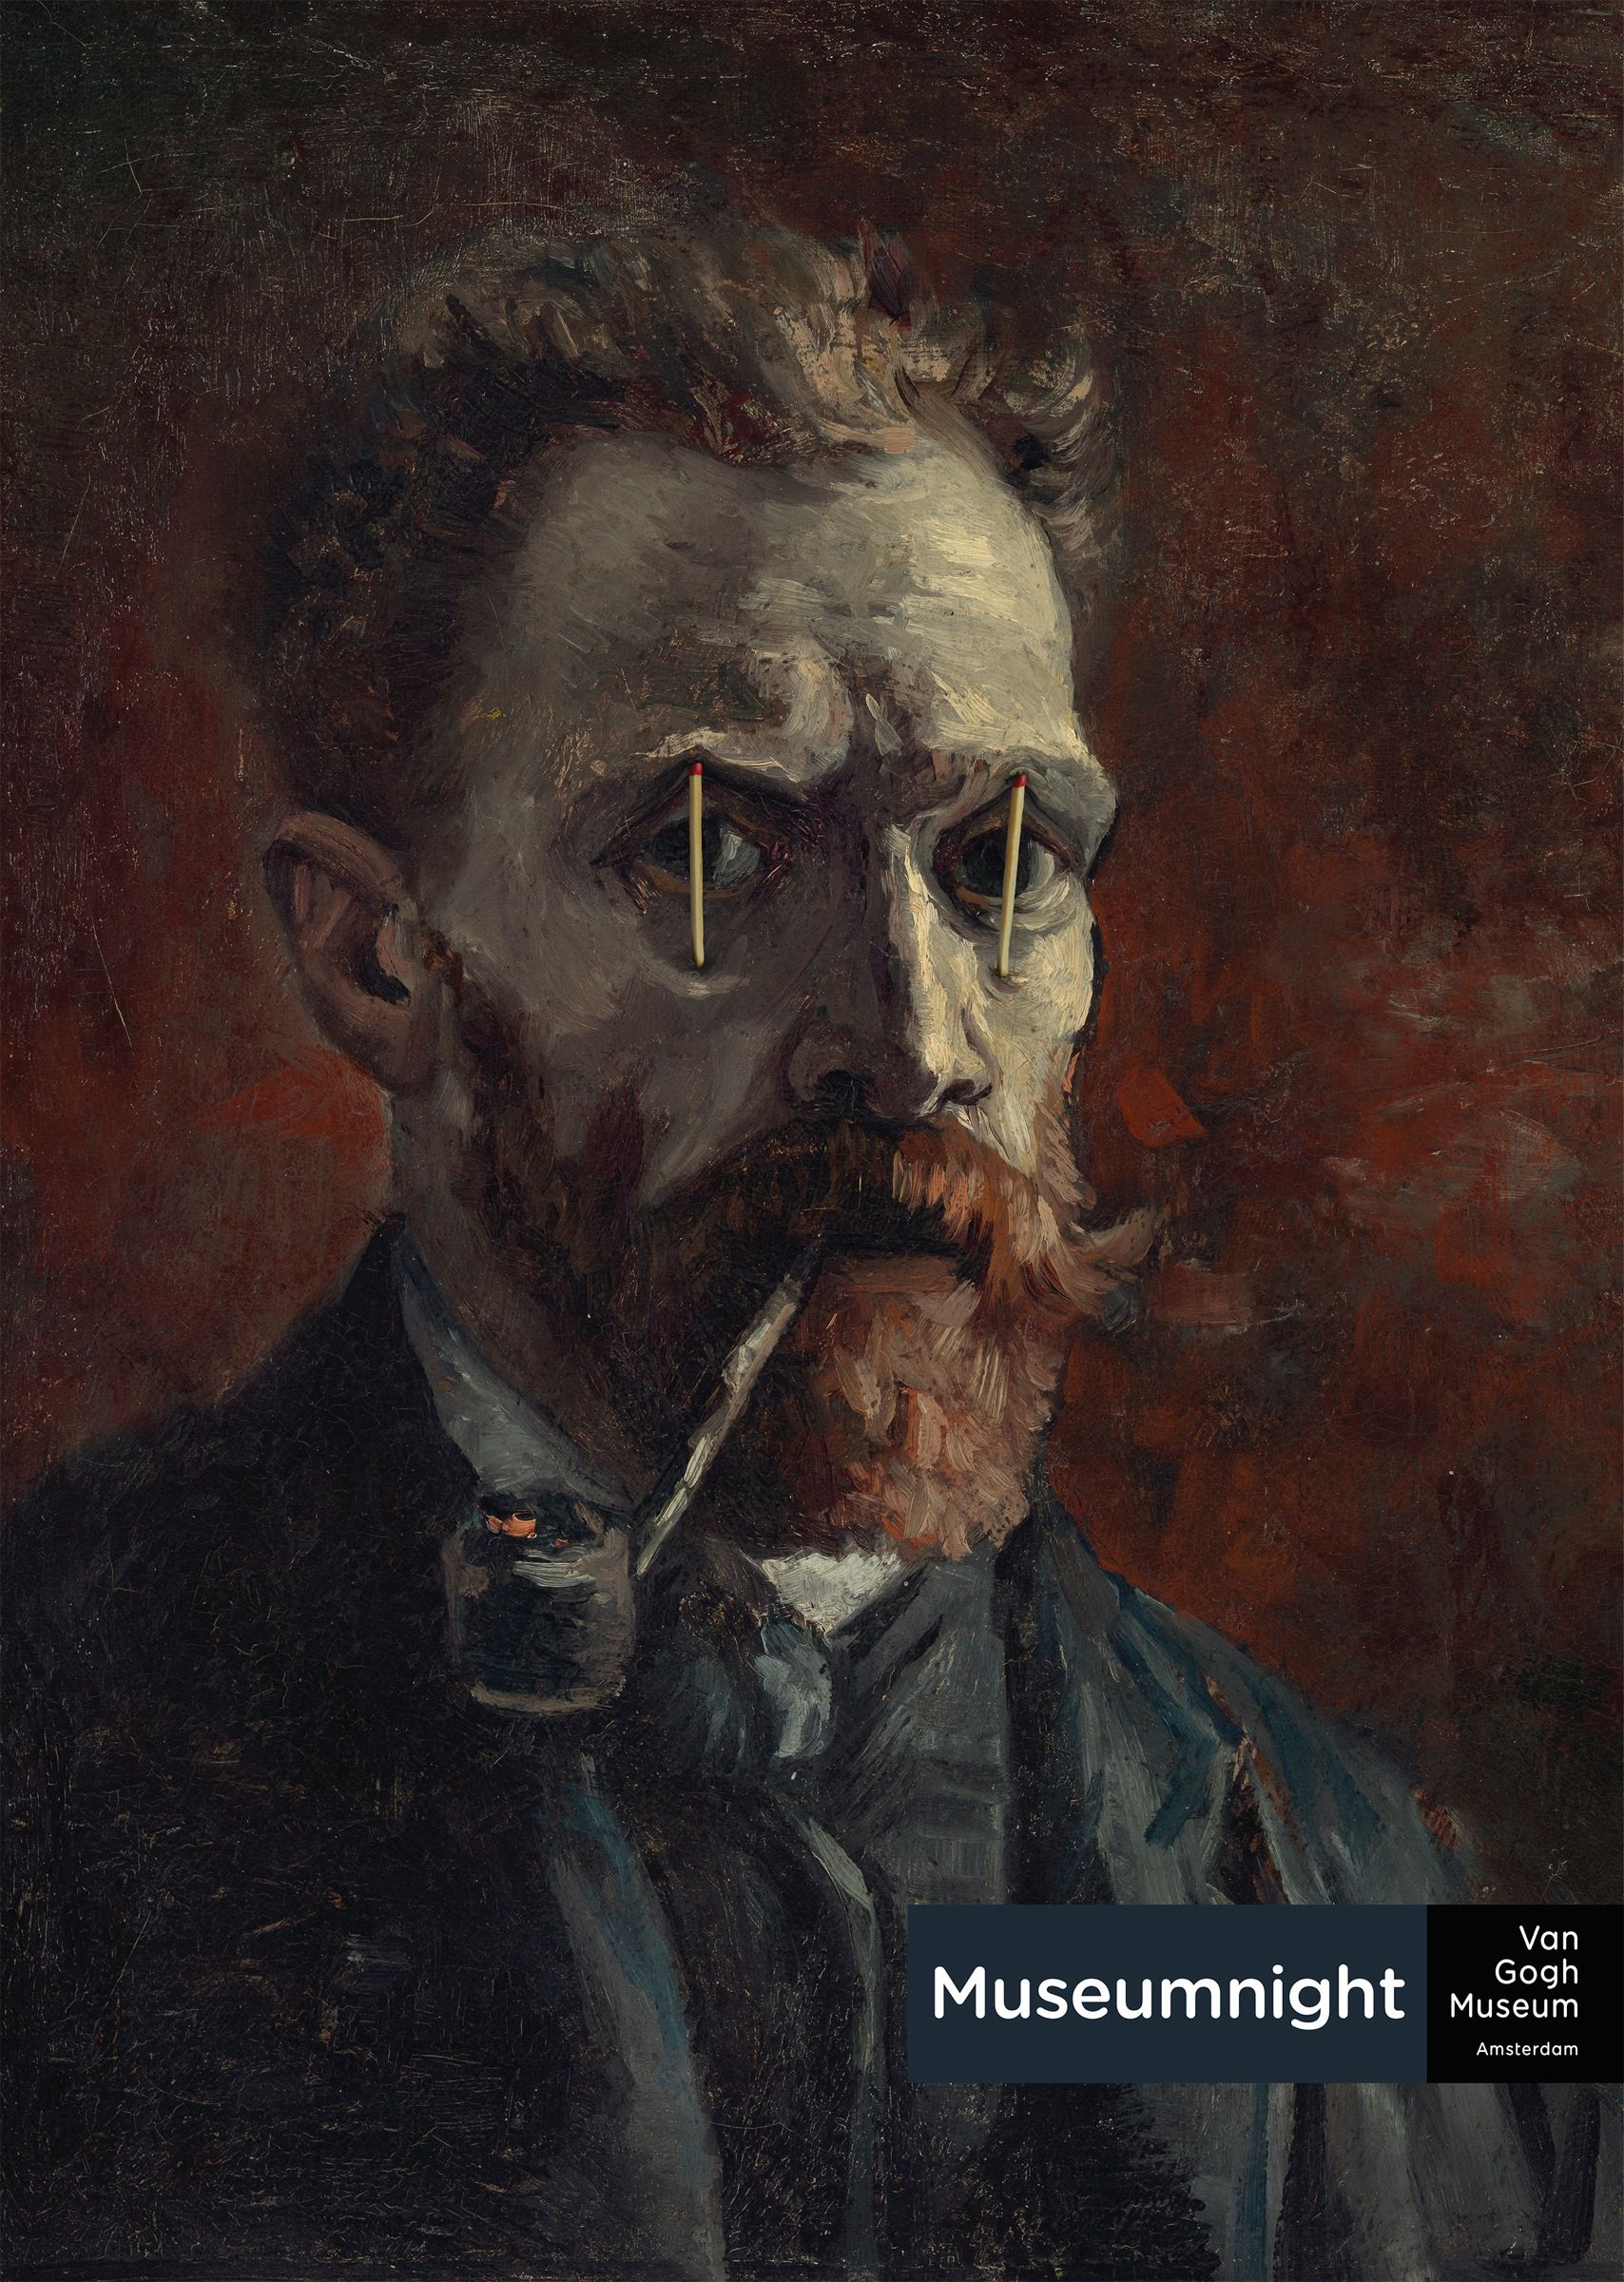 Museumnight - Van Gogh Museum